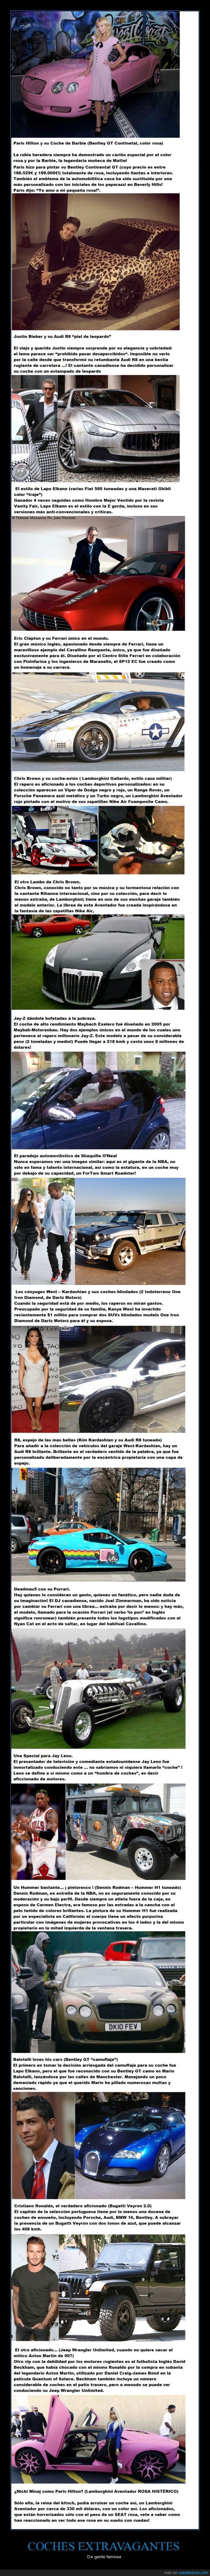 artistas,cantante,coche,deportistas,extravagancias,Jay-Z,Justin Bieber,Kanye West,Kim Kardashian,Nicki Minaj,Paris Hilton